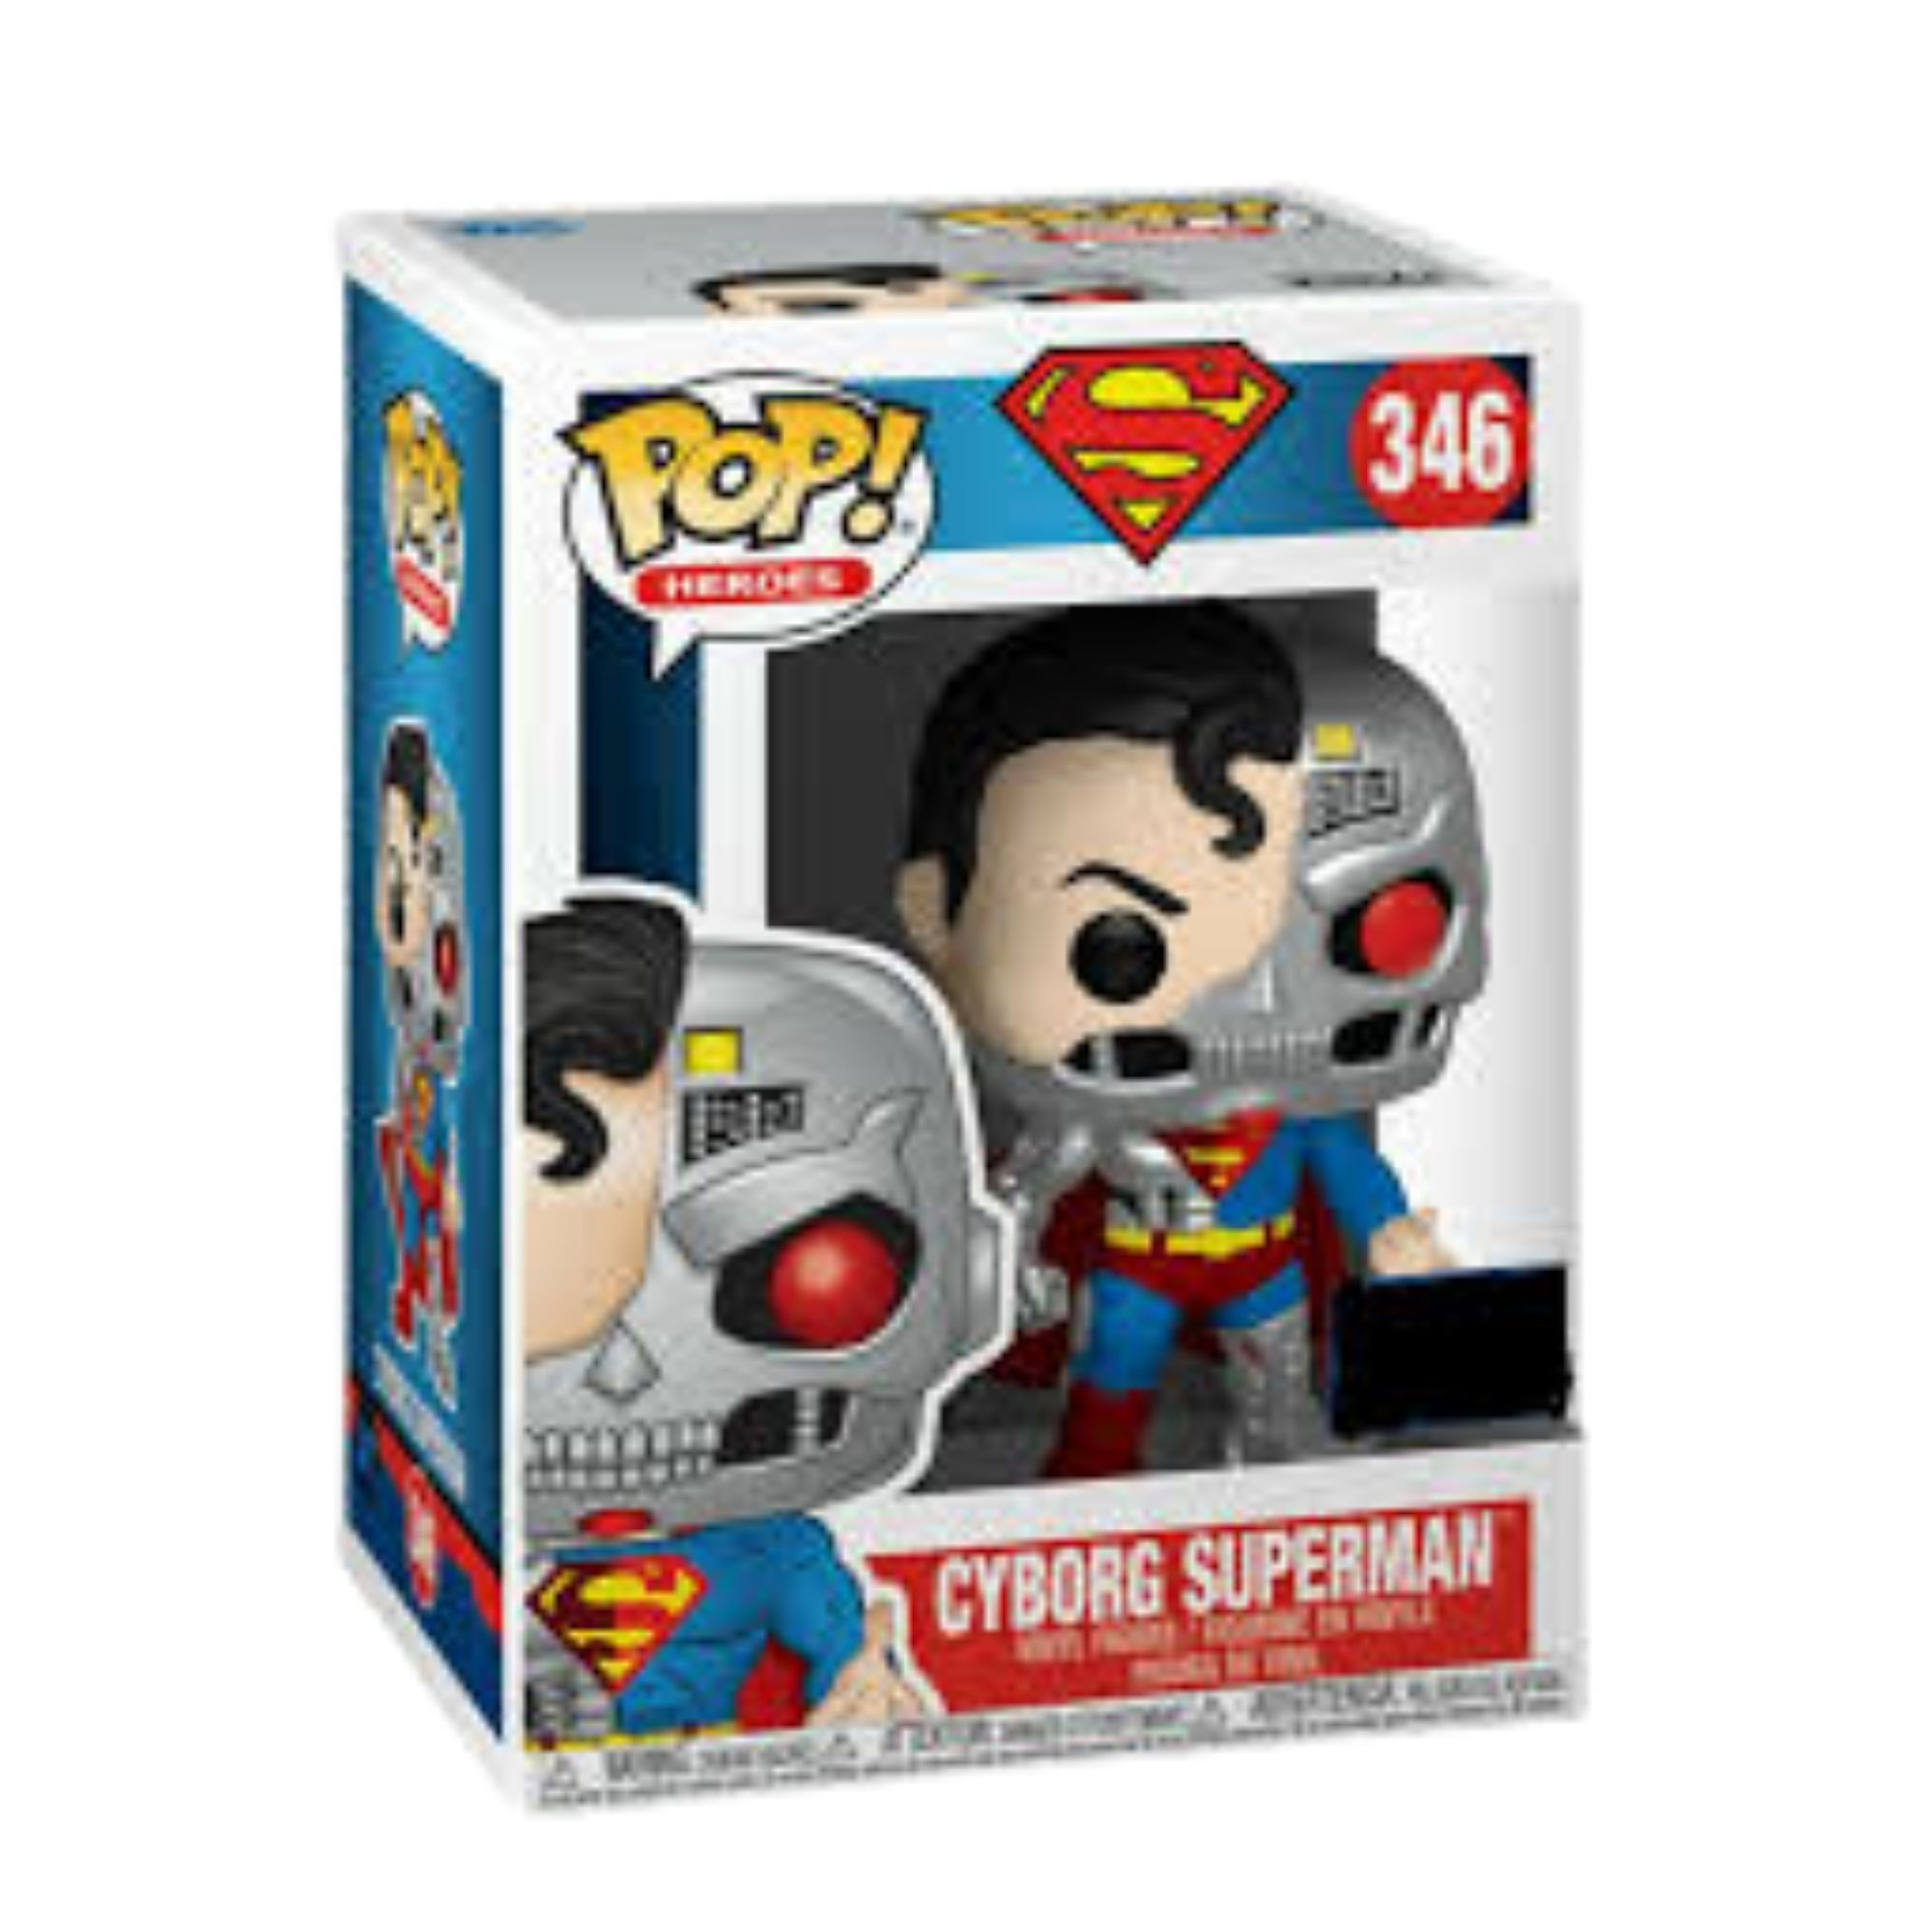 Funko Pop Heroes Cyborg Superman #346 Sdcc 2020  - Game Land Brinquedos